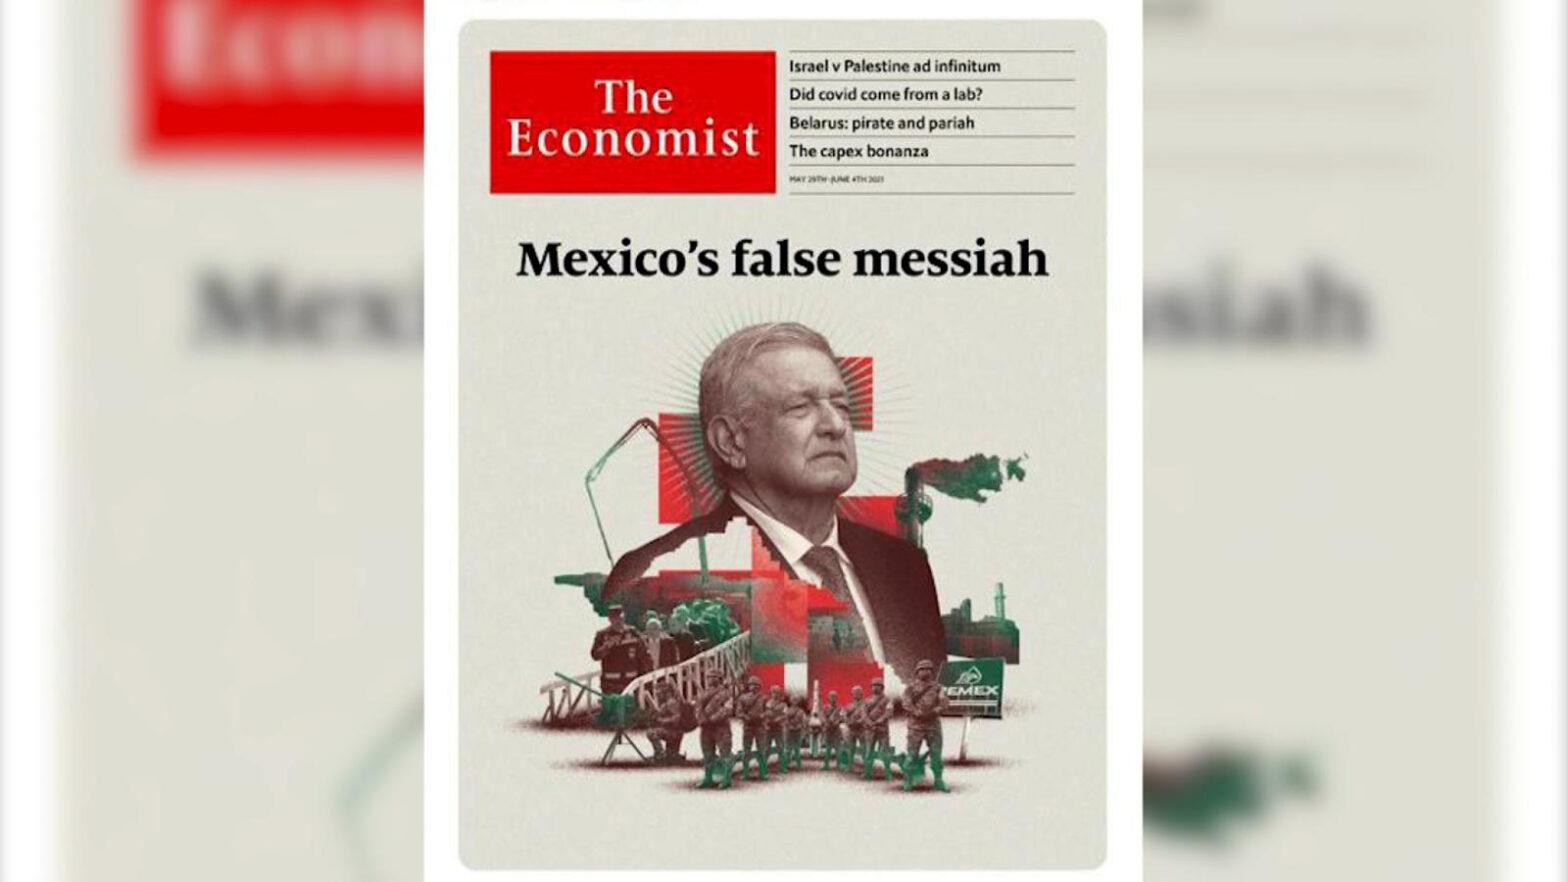 Portada del diario The Economist